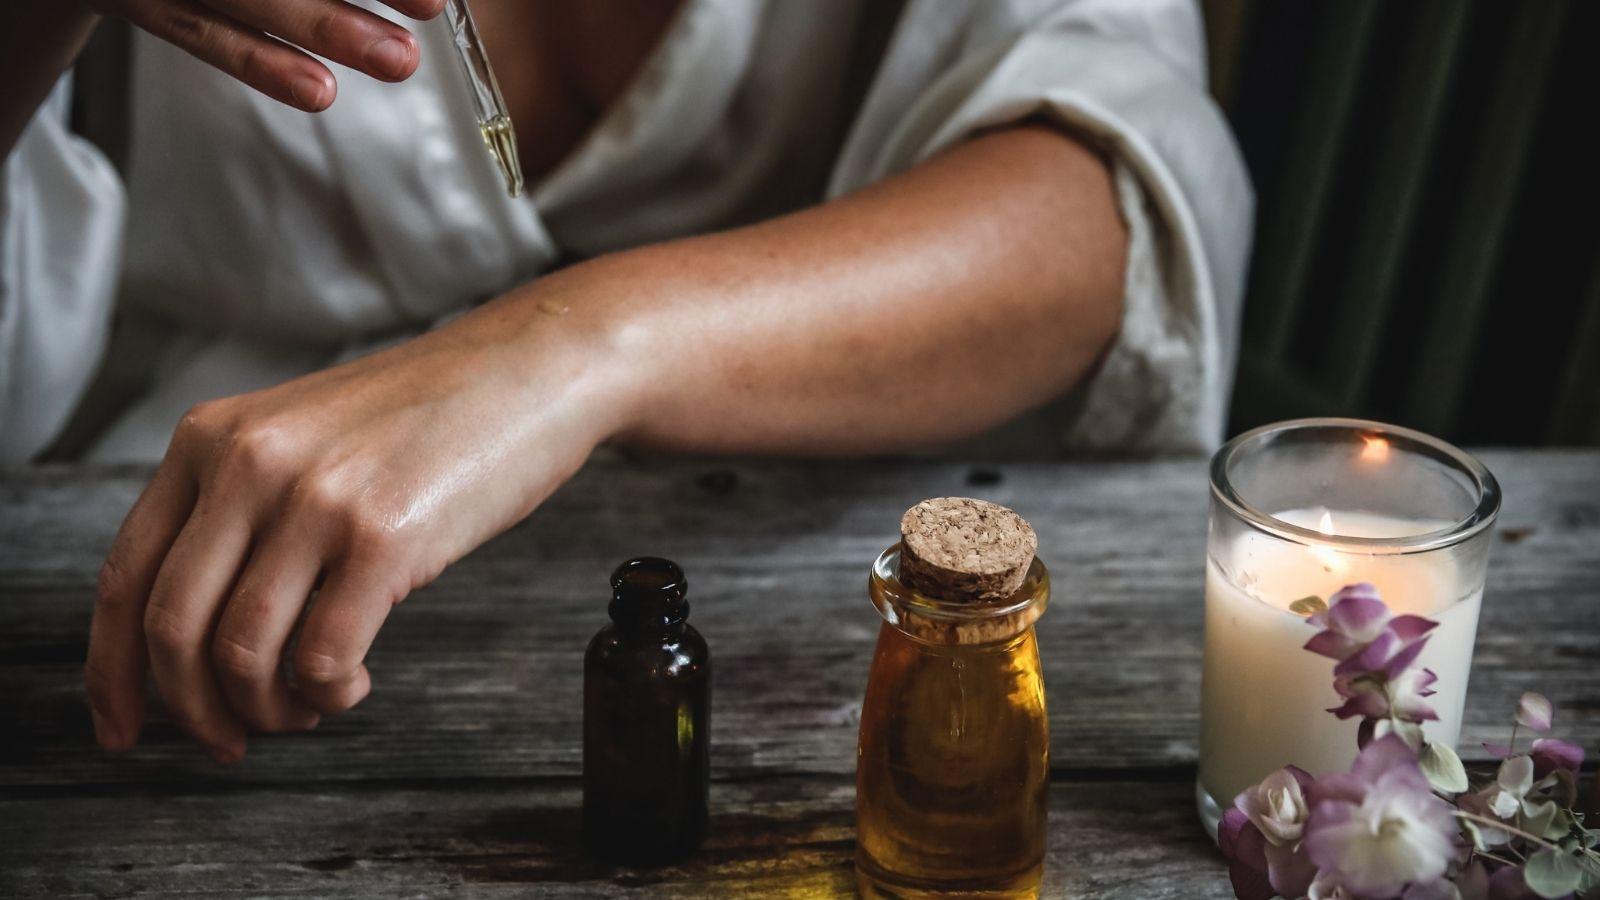 An aromatherapist drops essential oils onto her wrist.